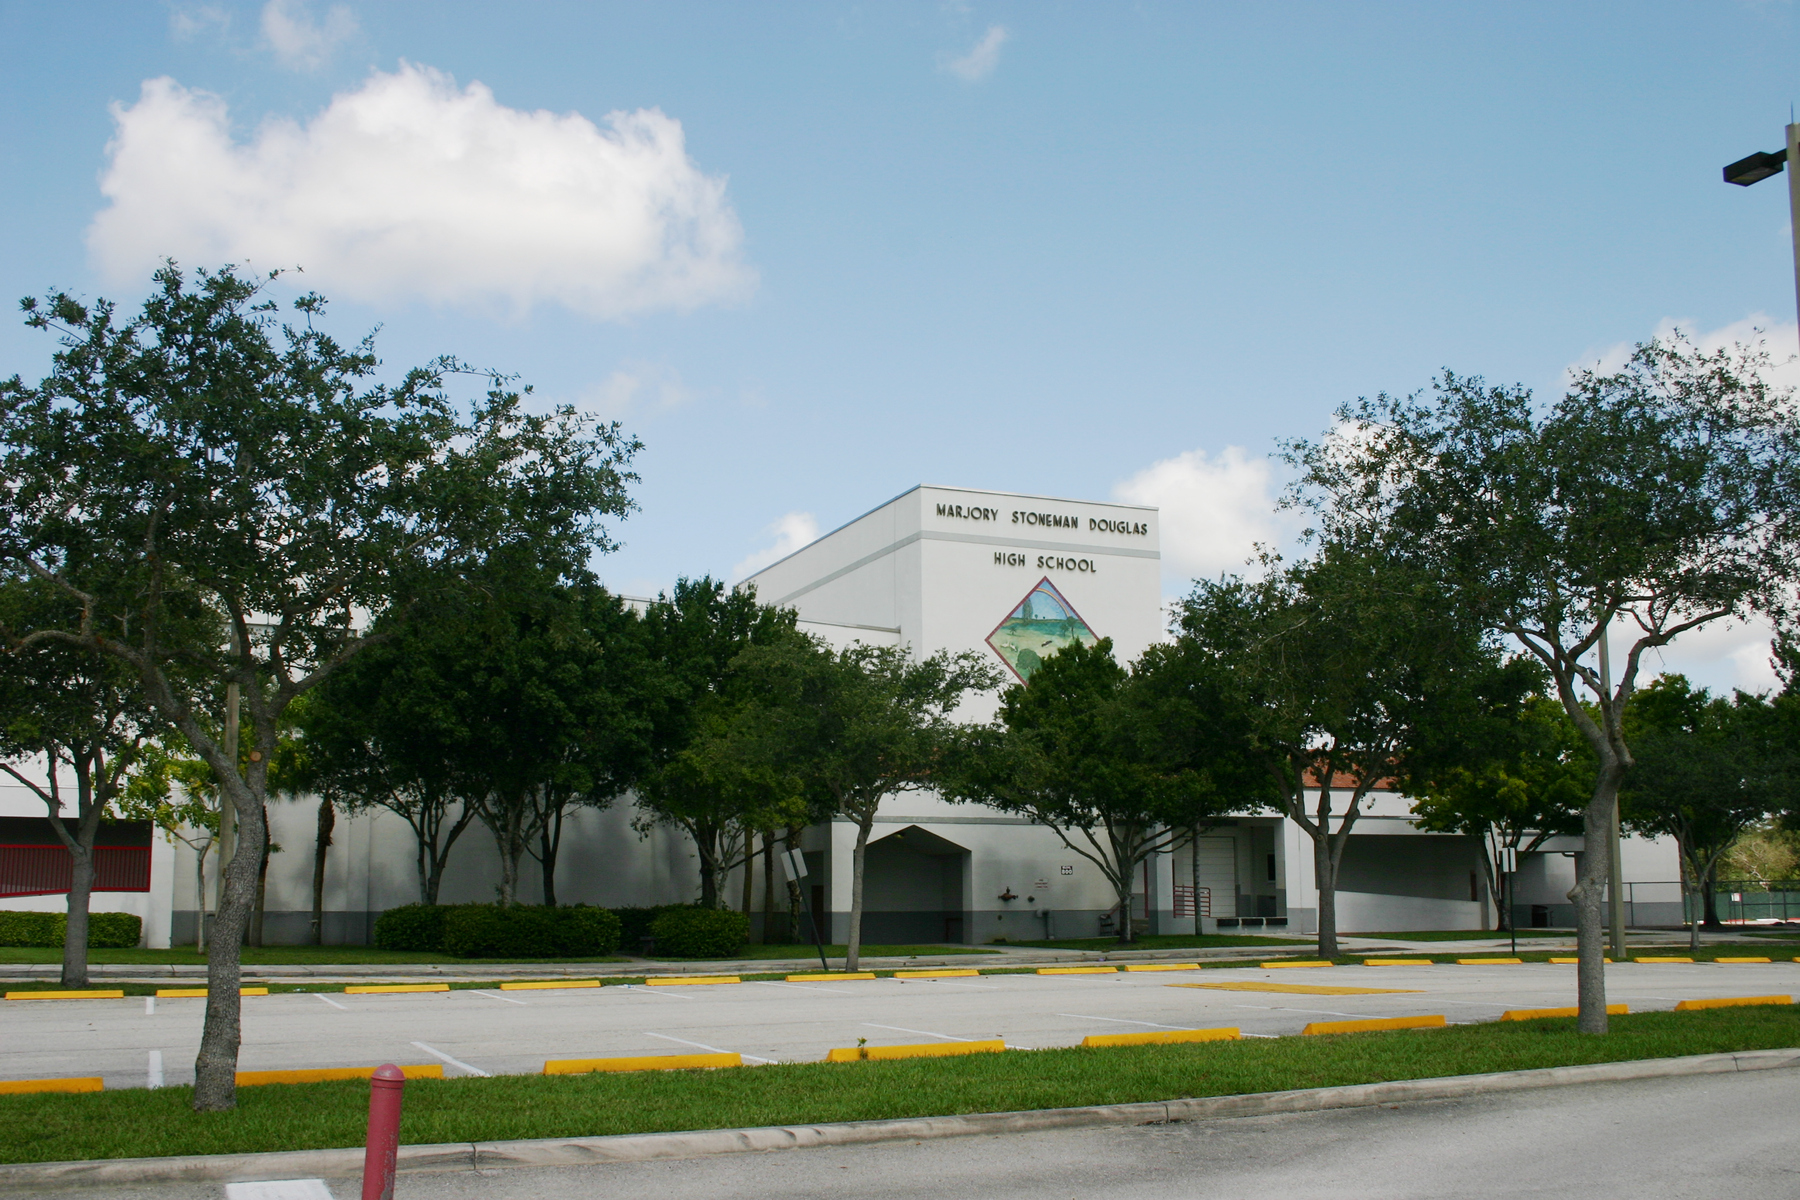 loading image for Marjory Stoneman Douglas High School